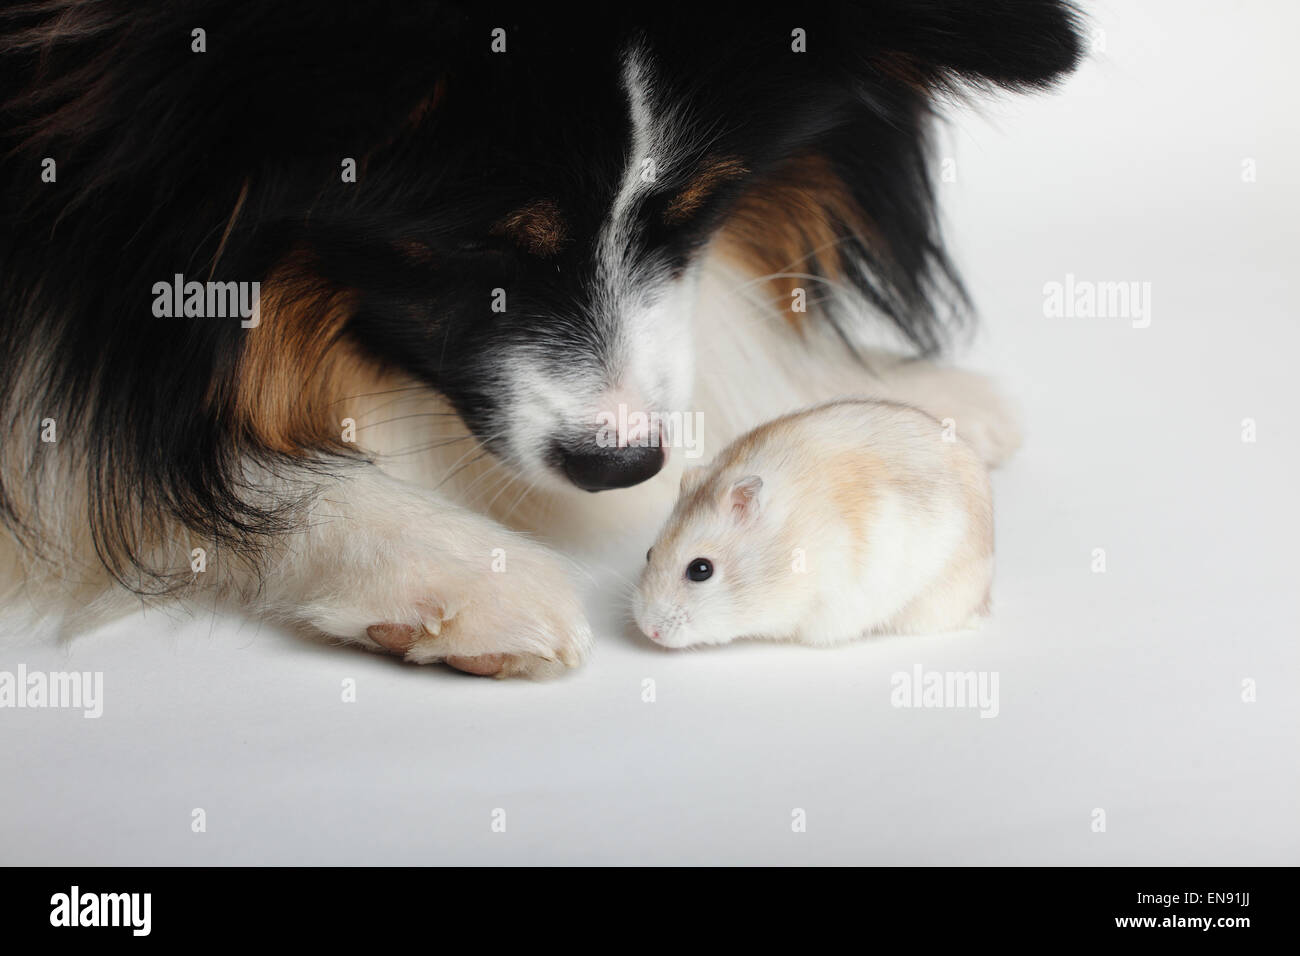 Russian Dwarf Hamster / (Phodopus sungorus) Dsungarischer Zwerghamster / (Phodopus sungorus) - Stock Image